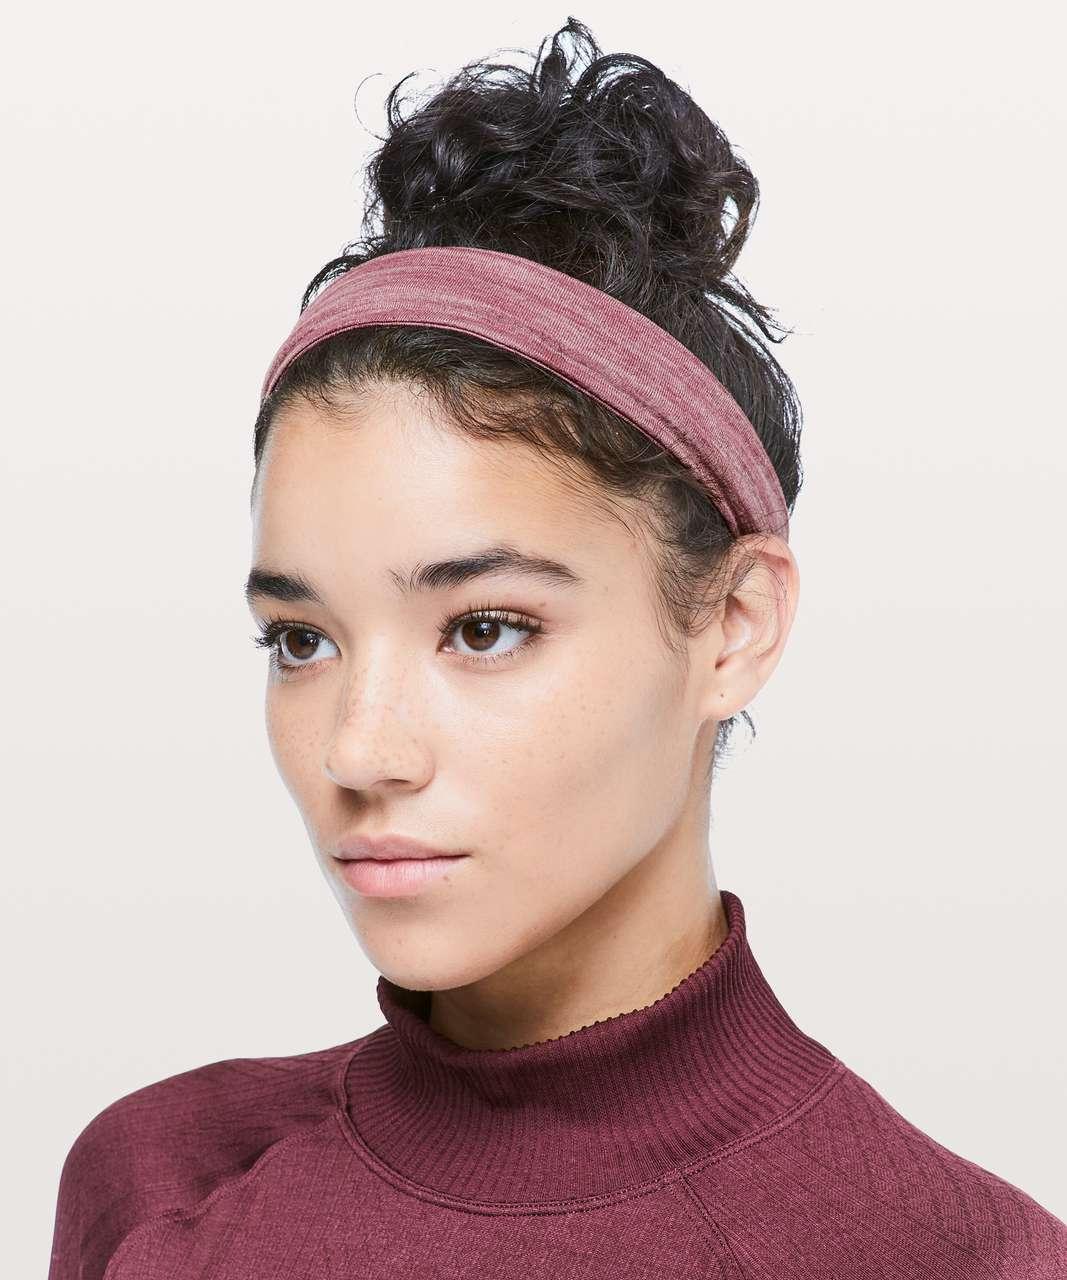 Lululemon Fringe Fighter Headband - Heathered Misty Merlot